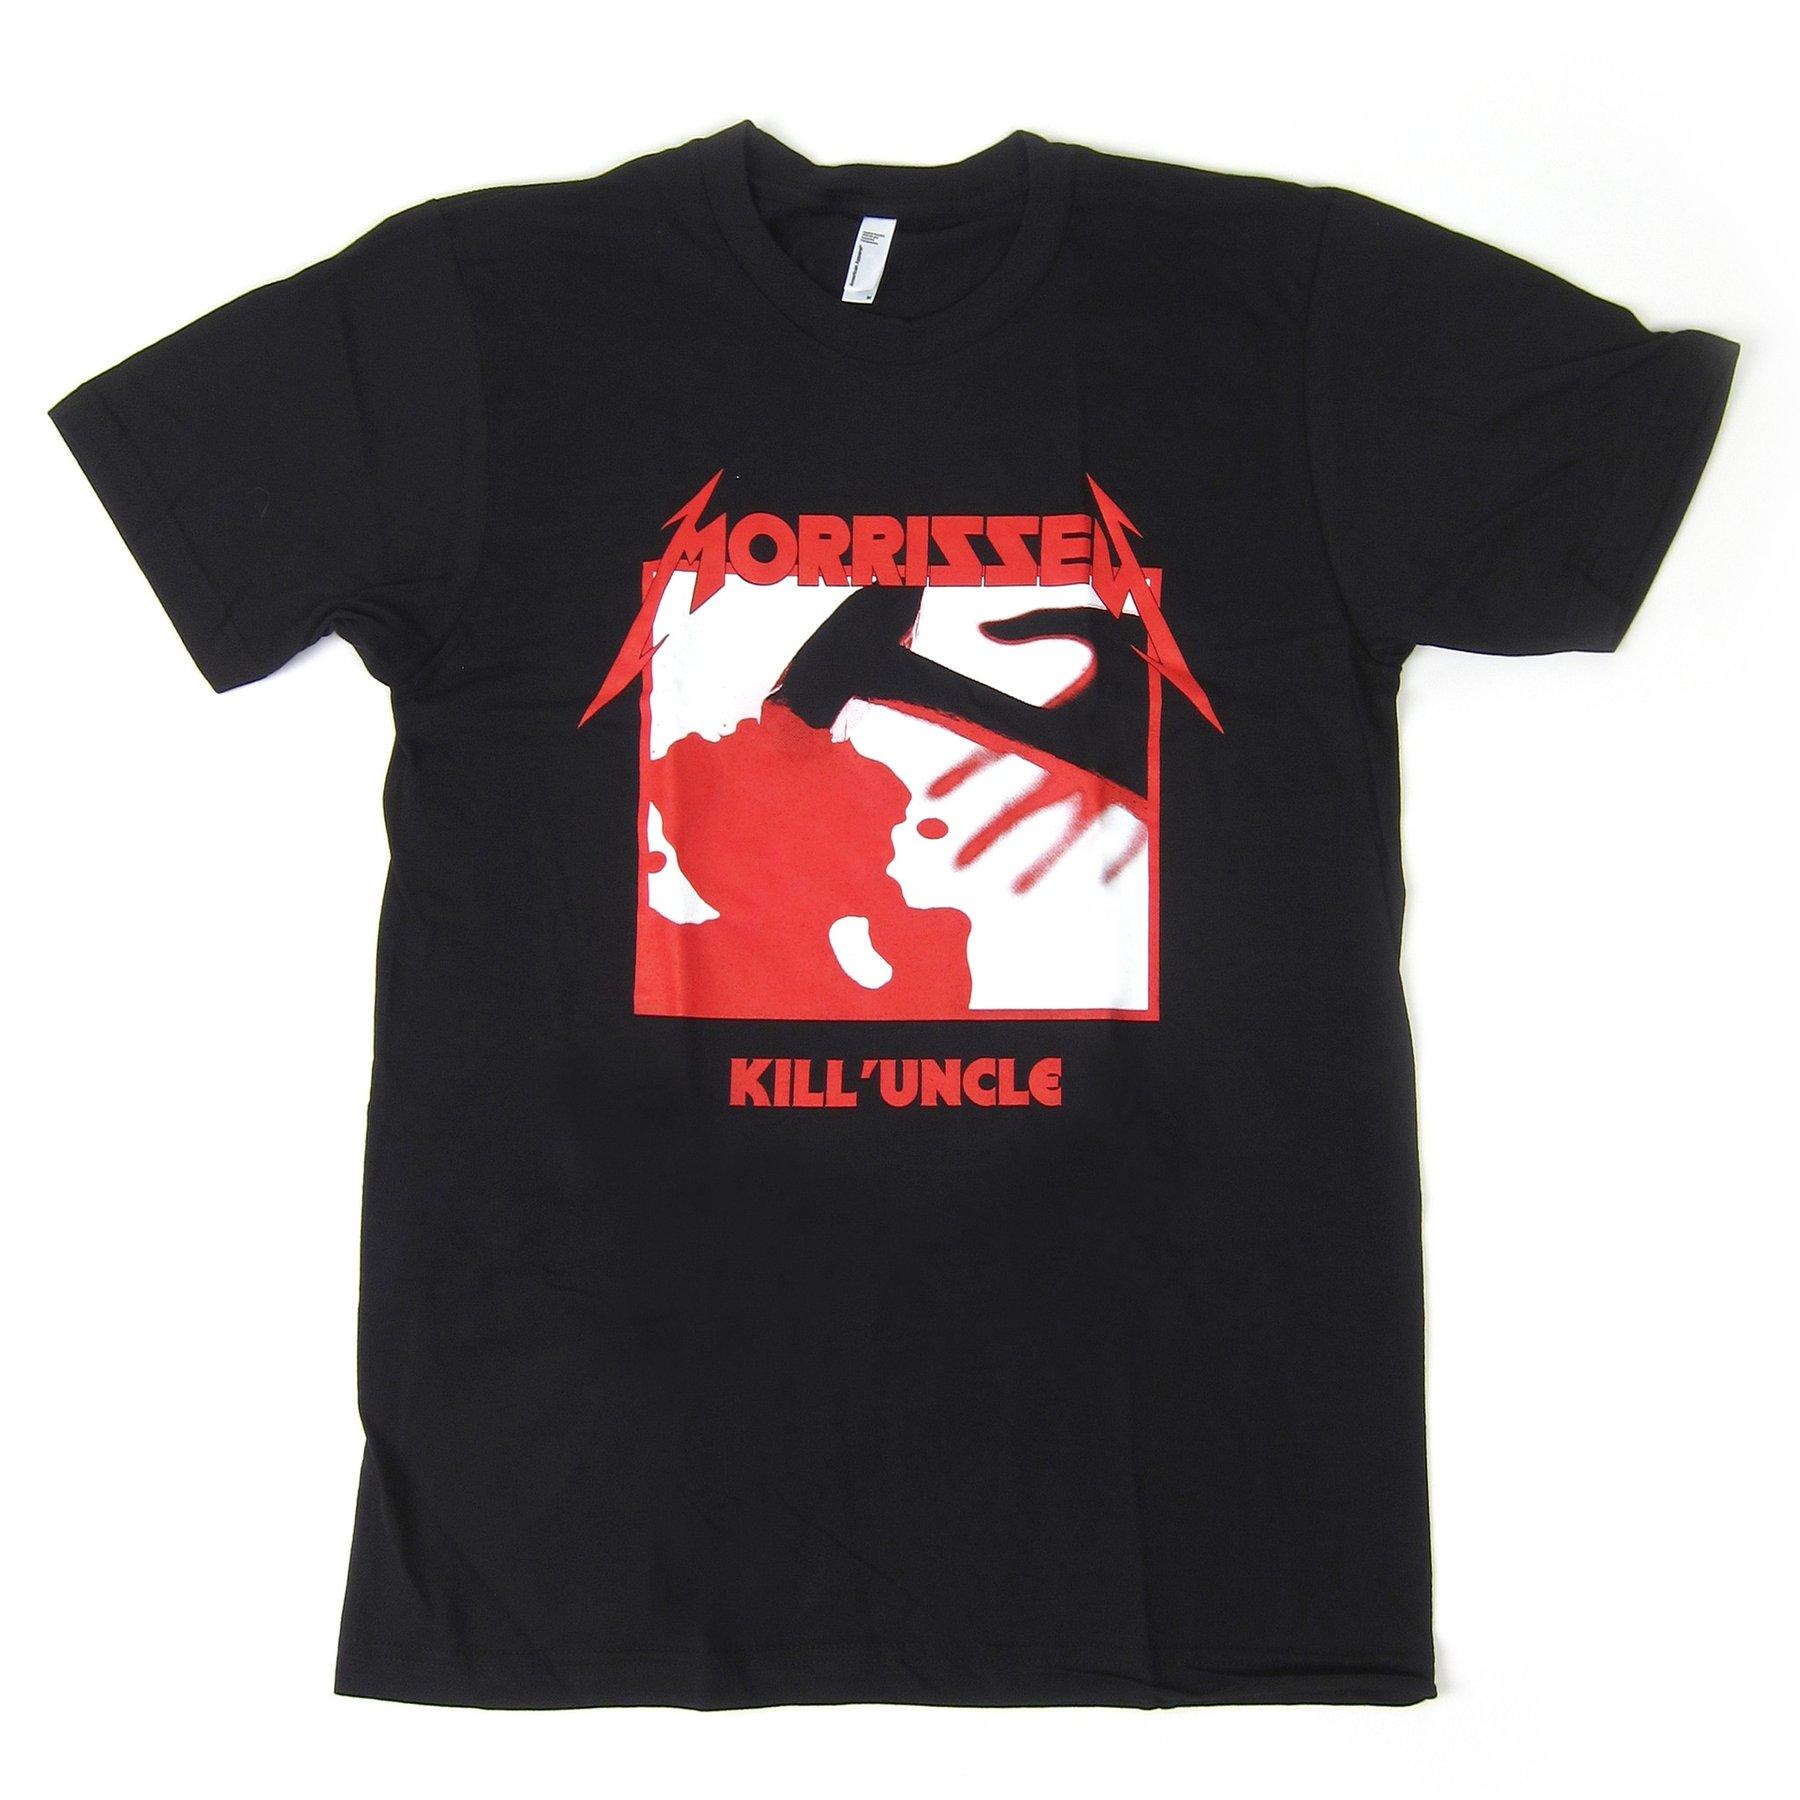 39482_morrissey-killuncle-shirt_1800x.jpg